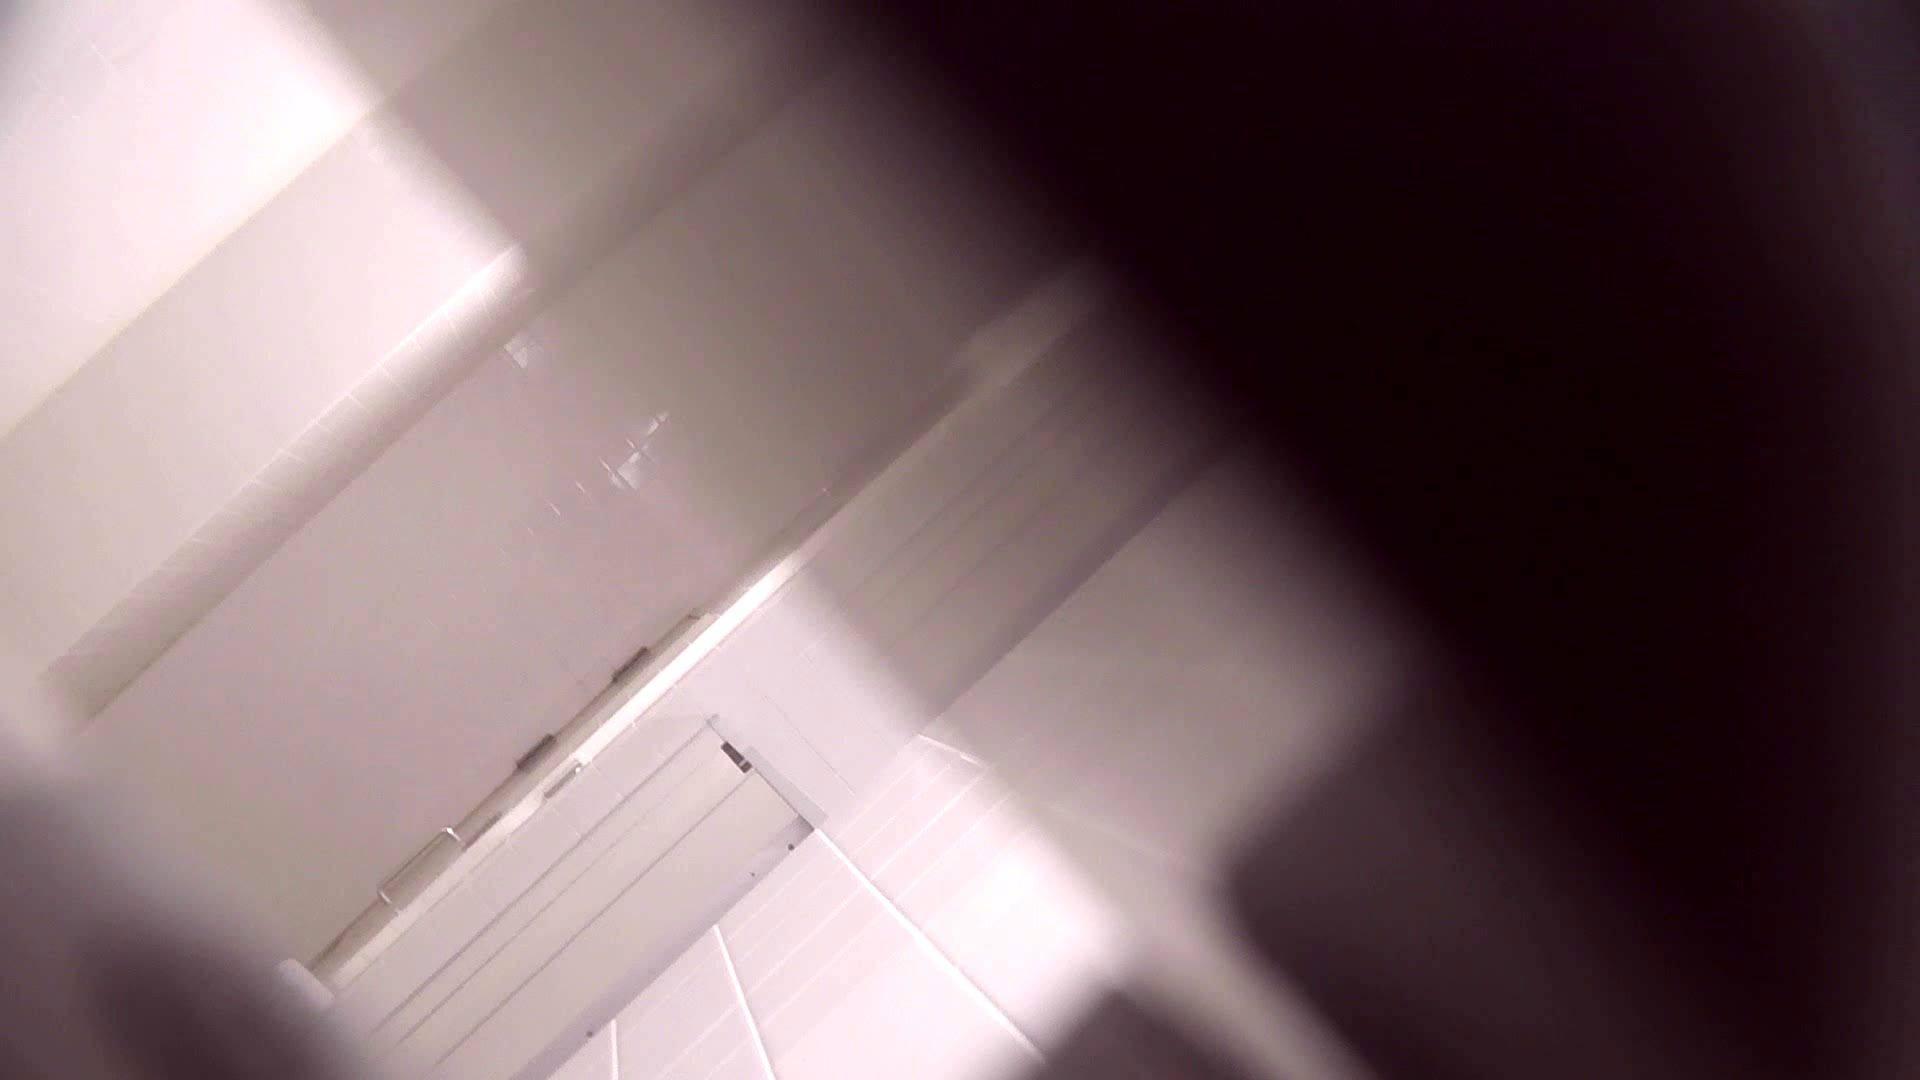 vol.17 命がけ潜伏洗面所! 張り裂けんばかりの大物 潜入   OLセックス  108画像 37